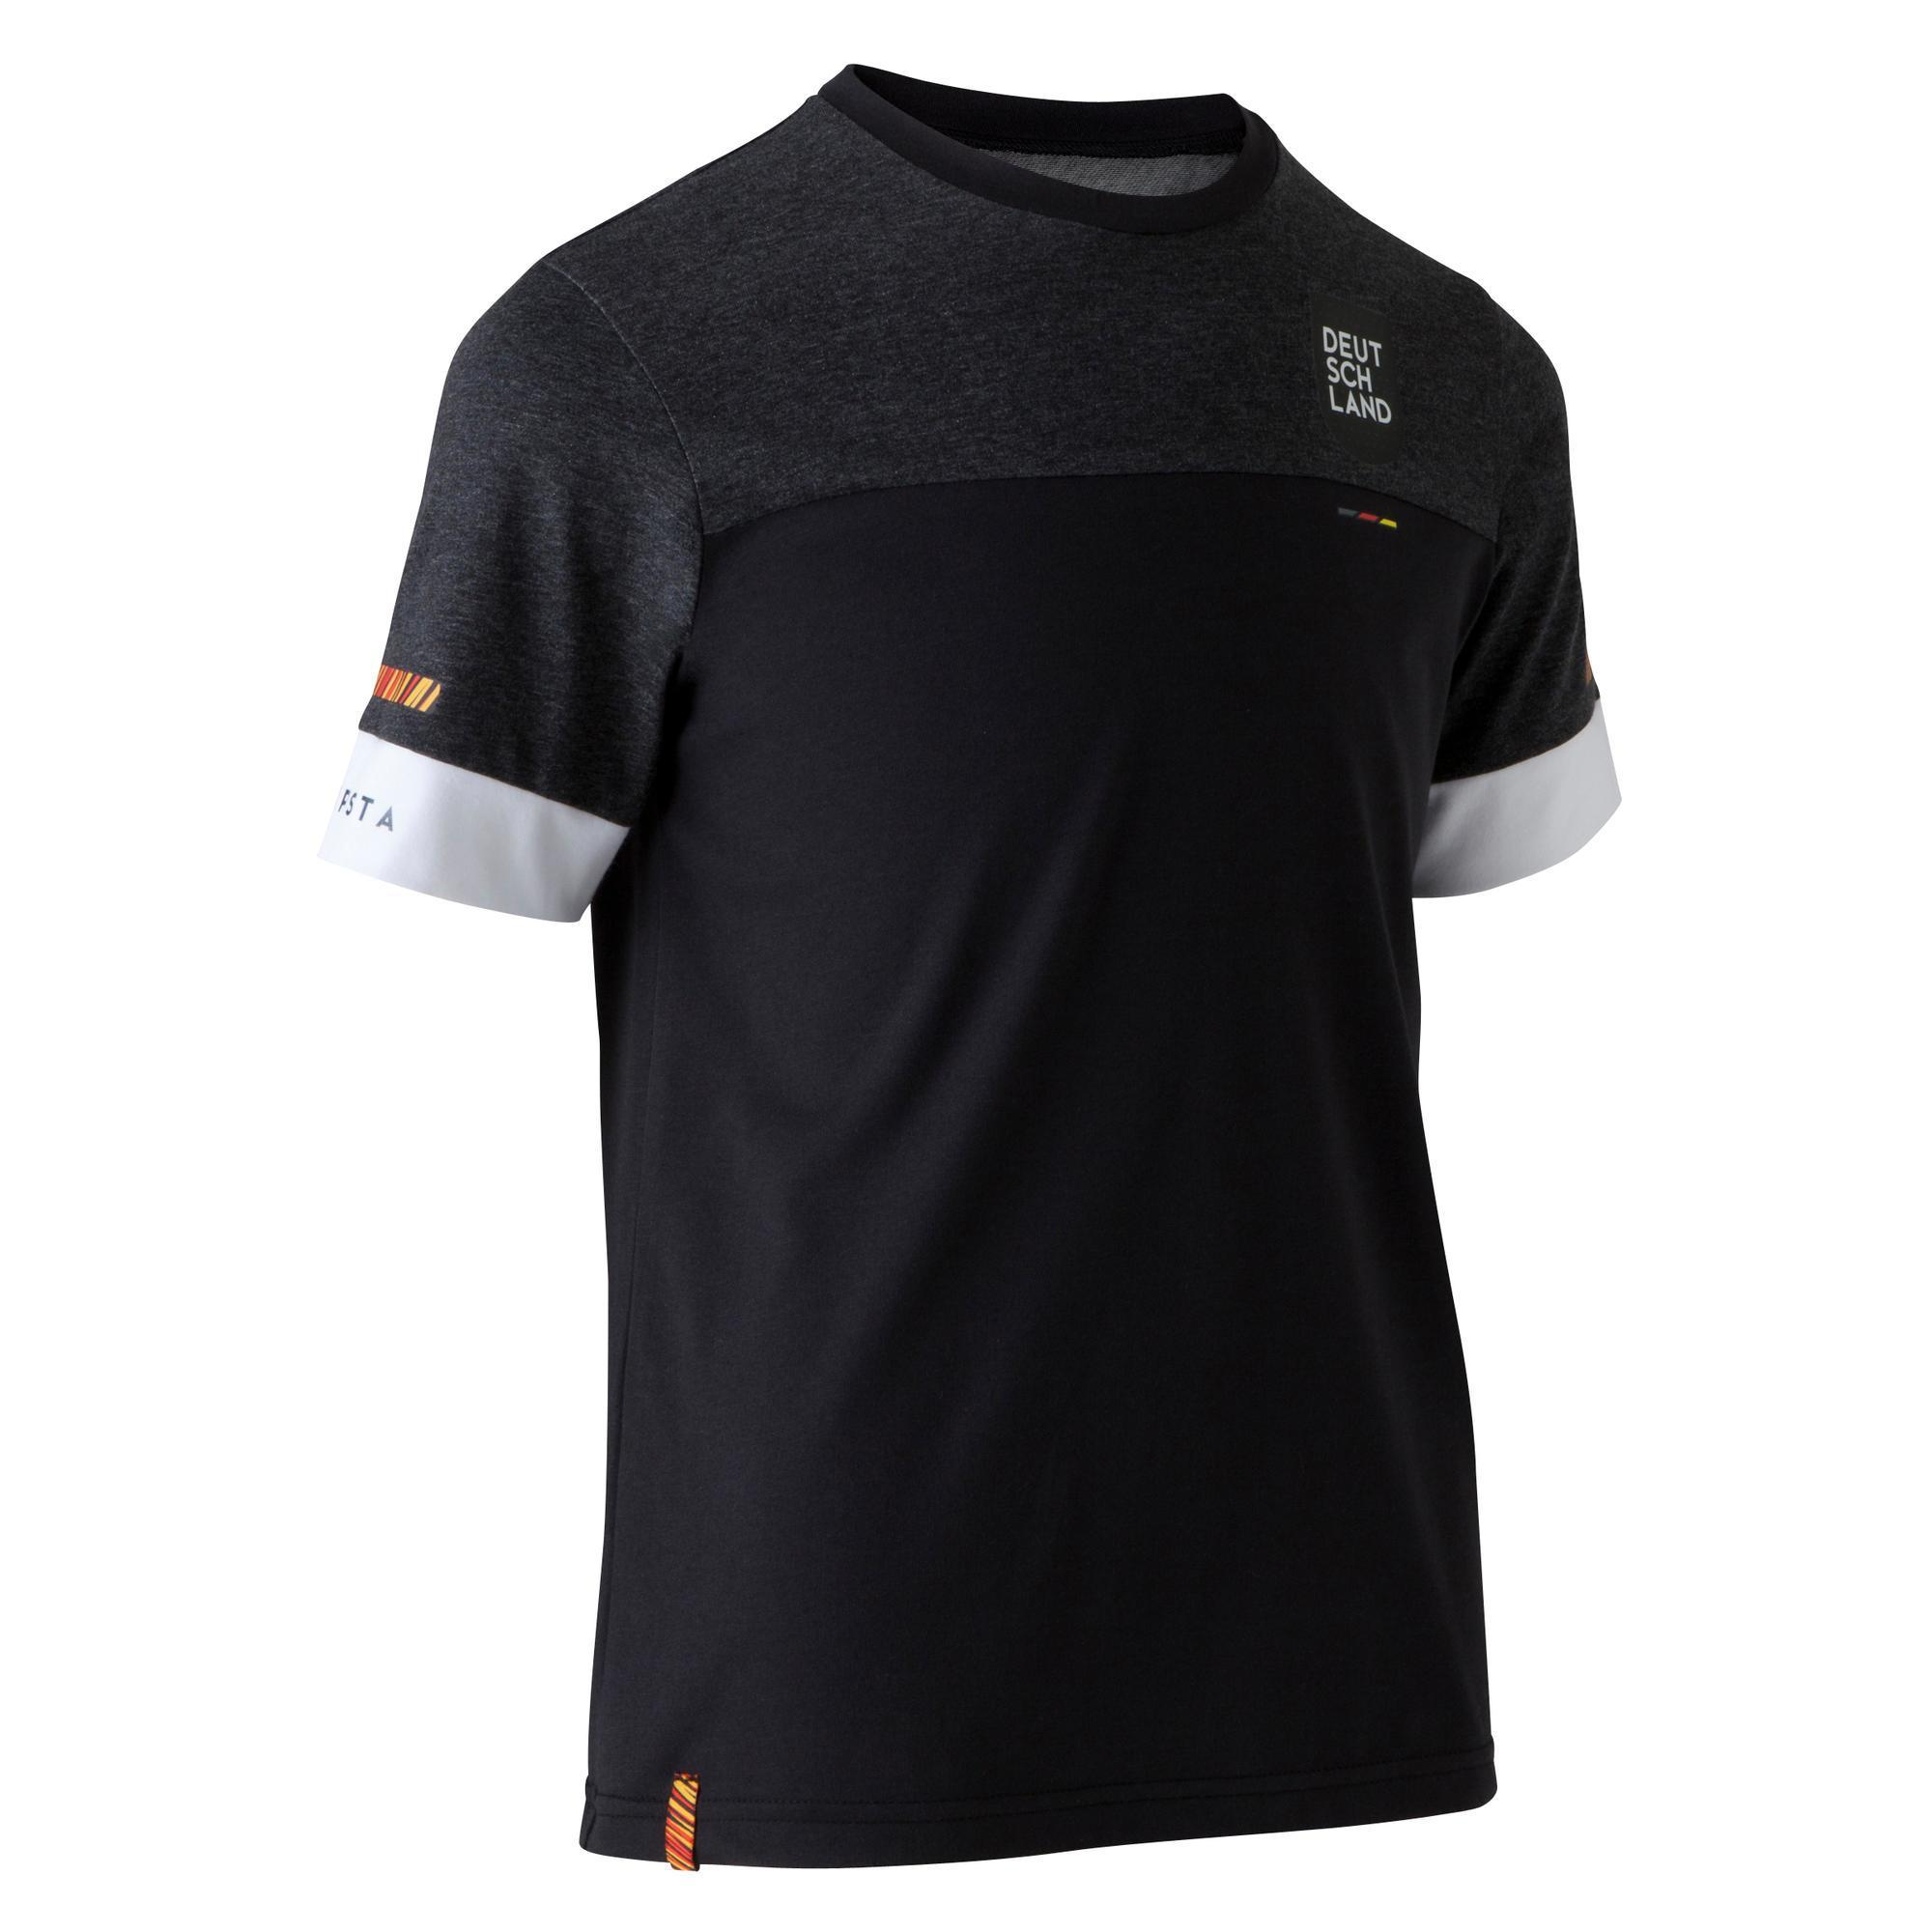 T shirt de football enfant ff100 allemagne noir kipsta